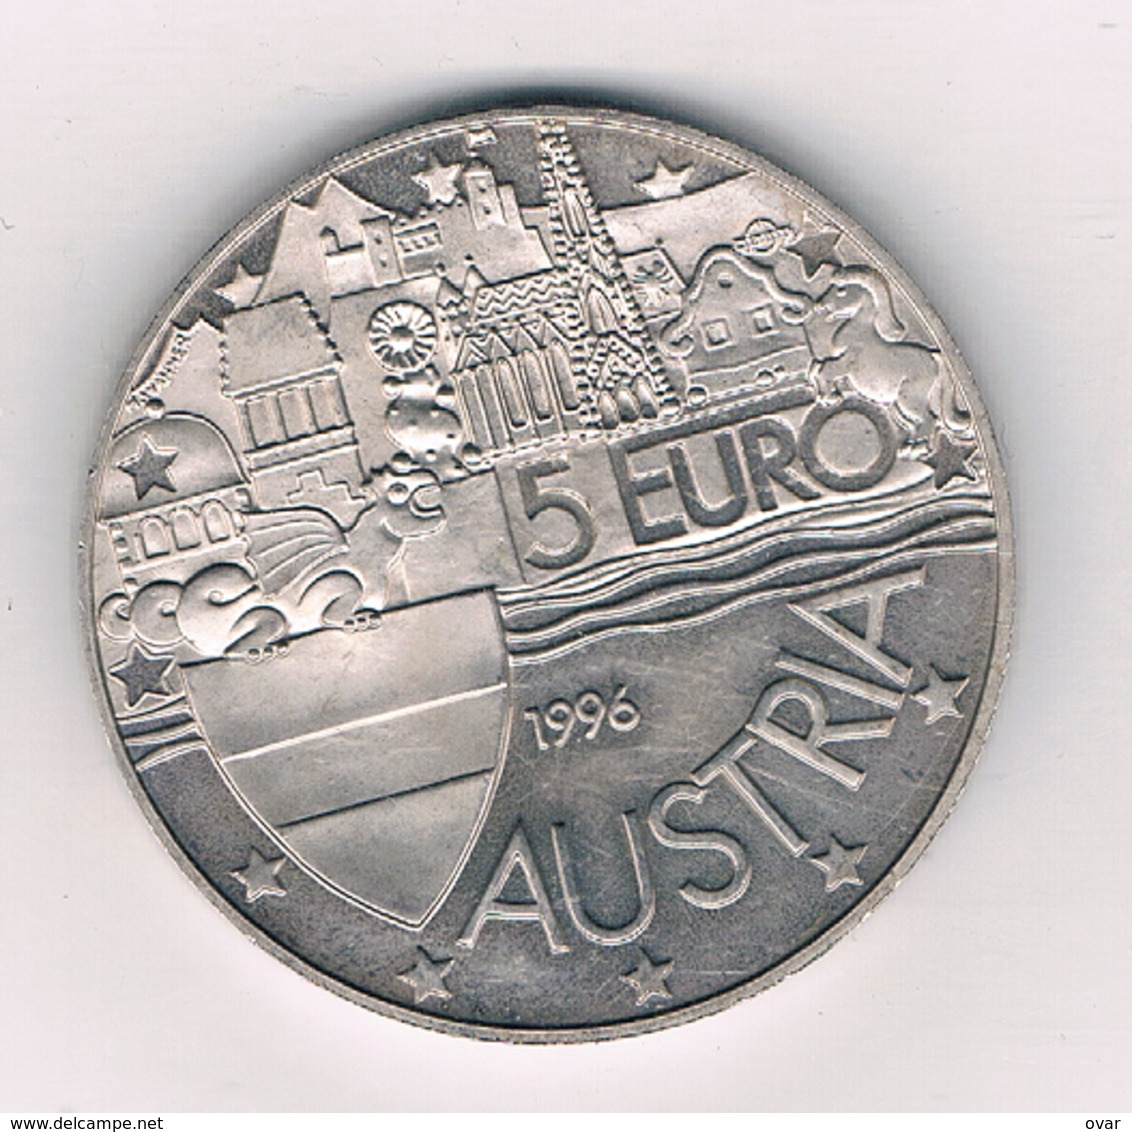 5 EURO 1996 OOSTENRIJK /980/ - Autriche